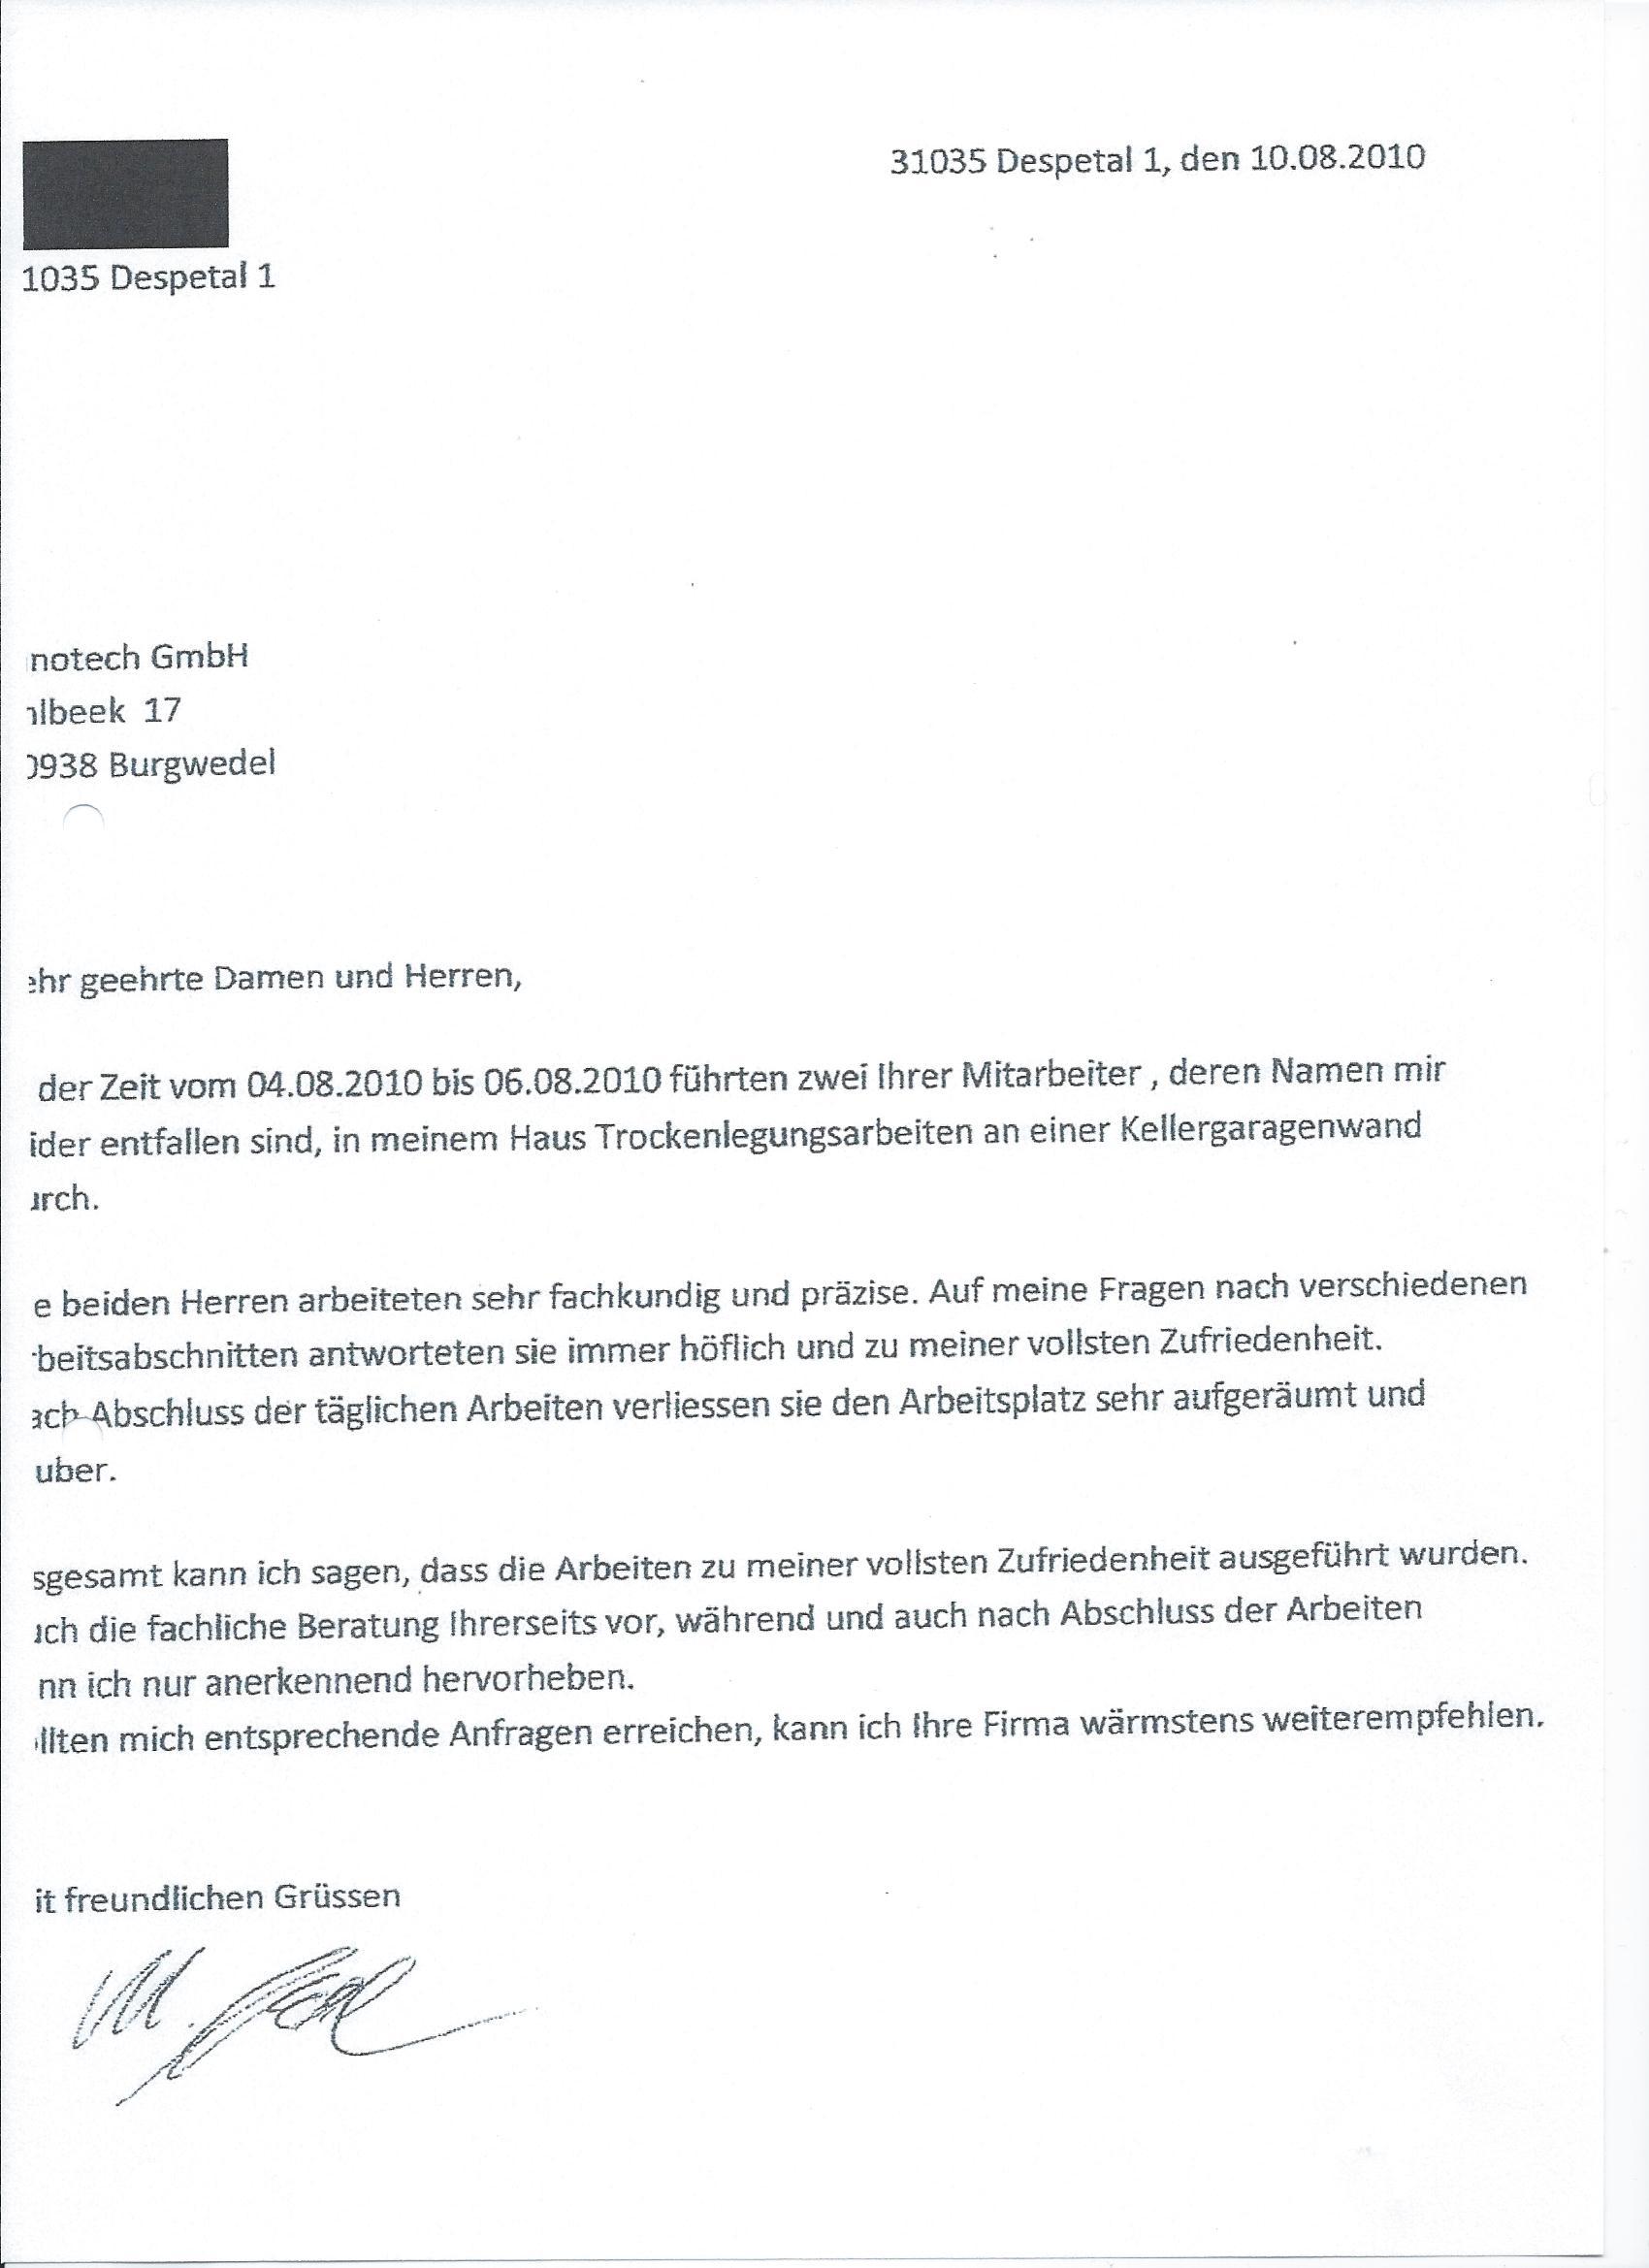 Großzügig Job Referenzformular Vorlage Ideen ...